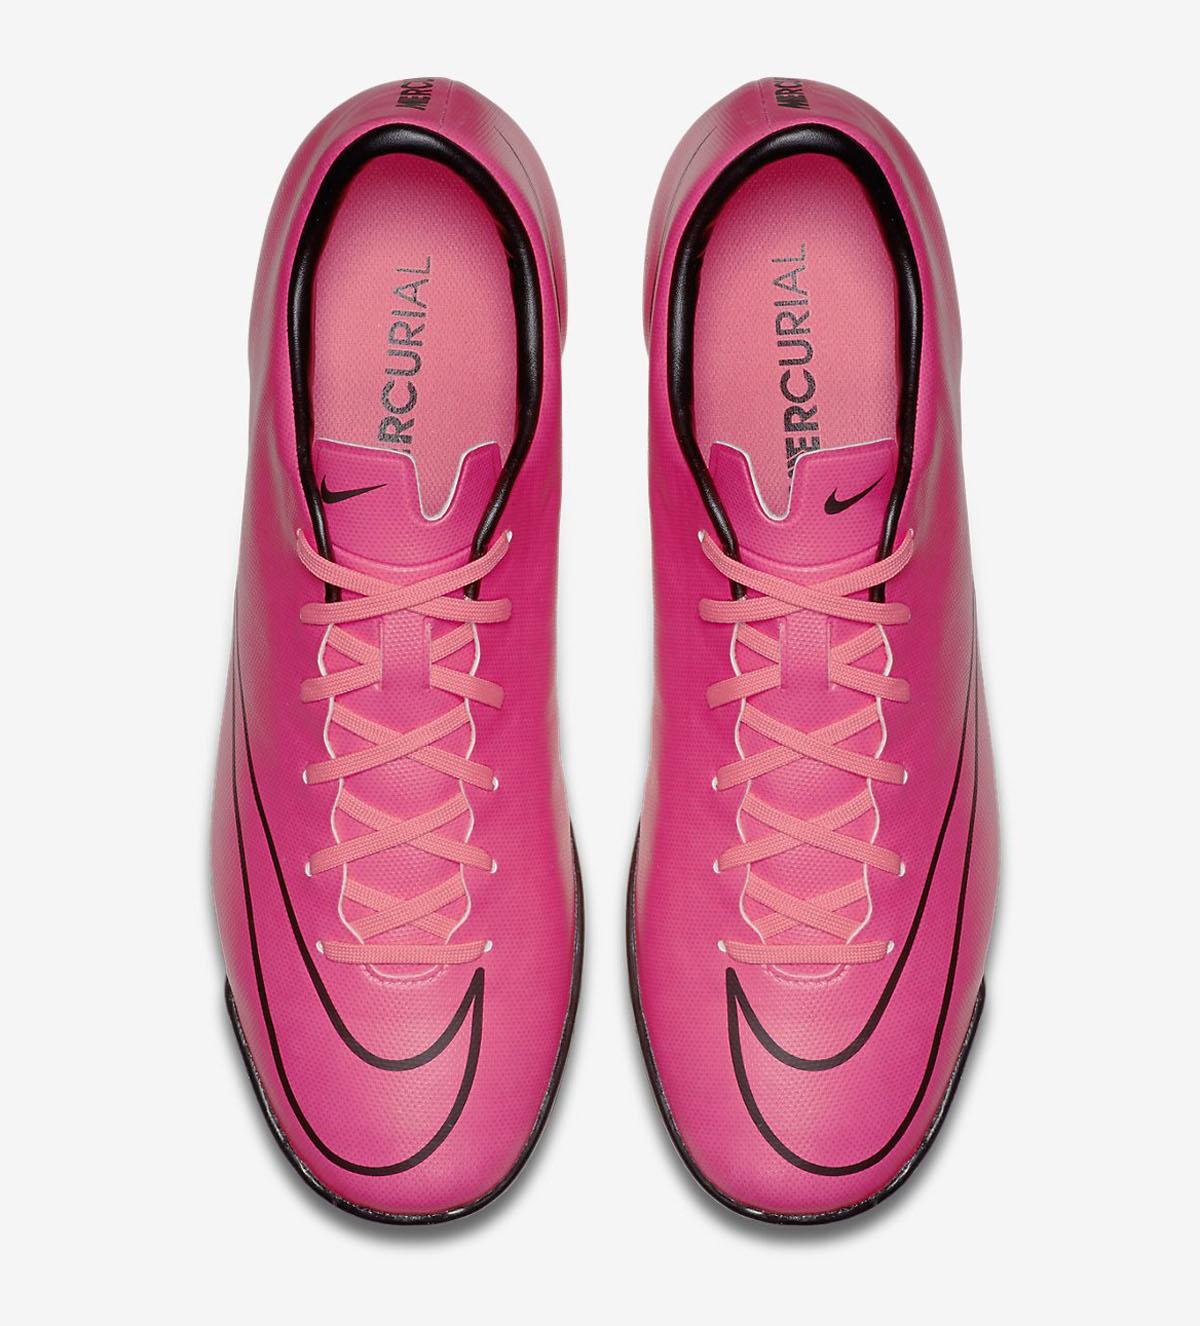 715f0def465 ... sepatu futsal nike mercurial victory v 651635 660 original 100 bnib .